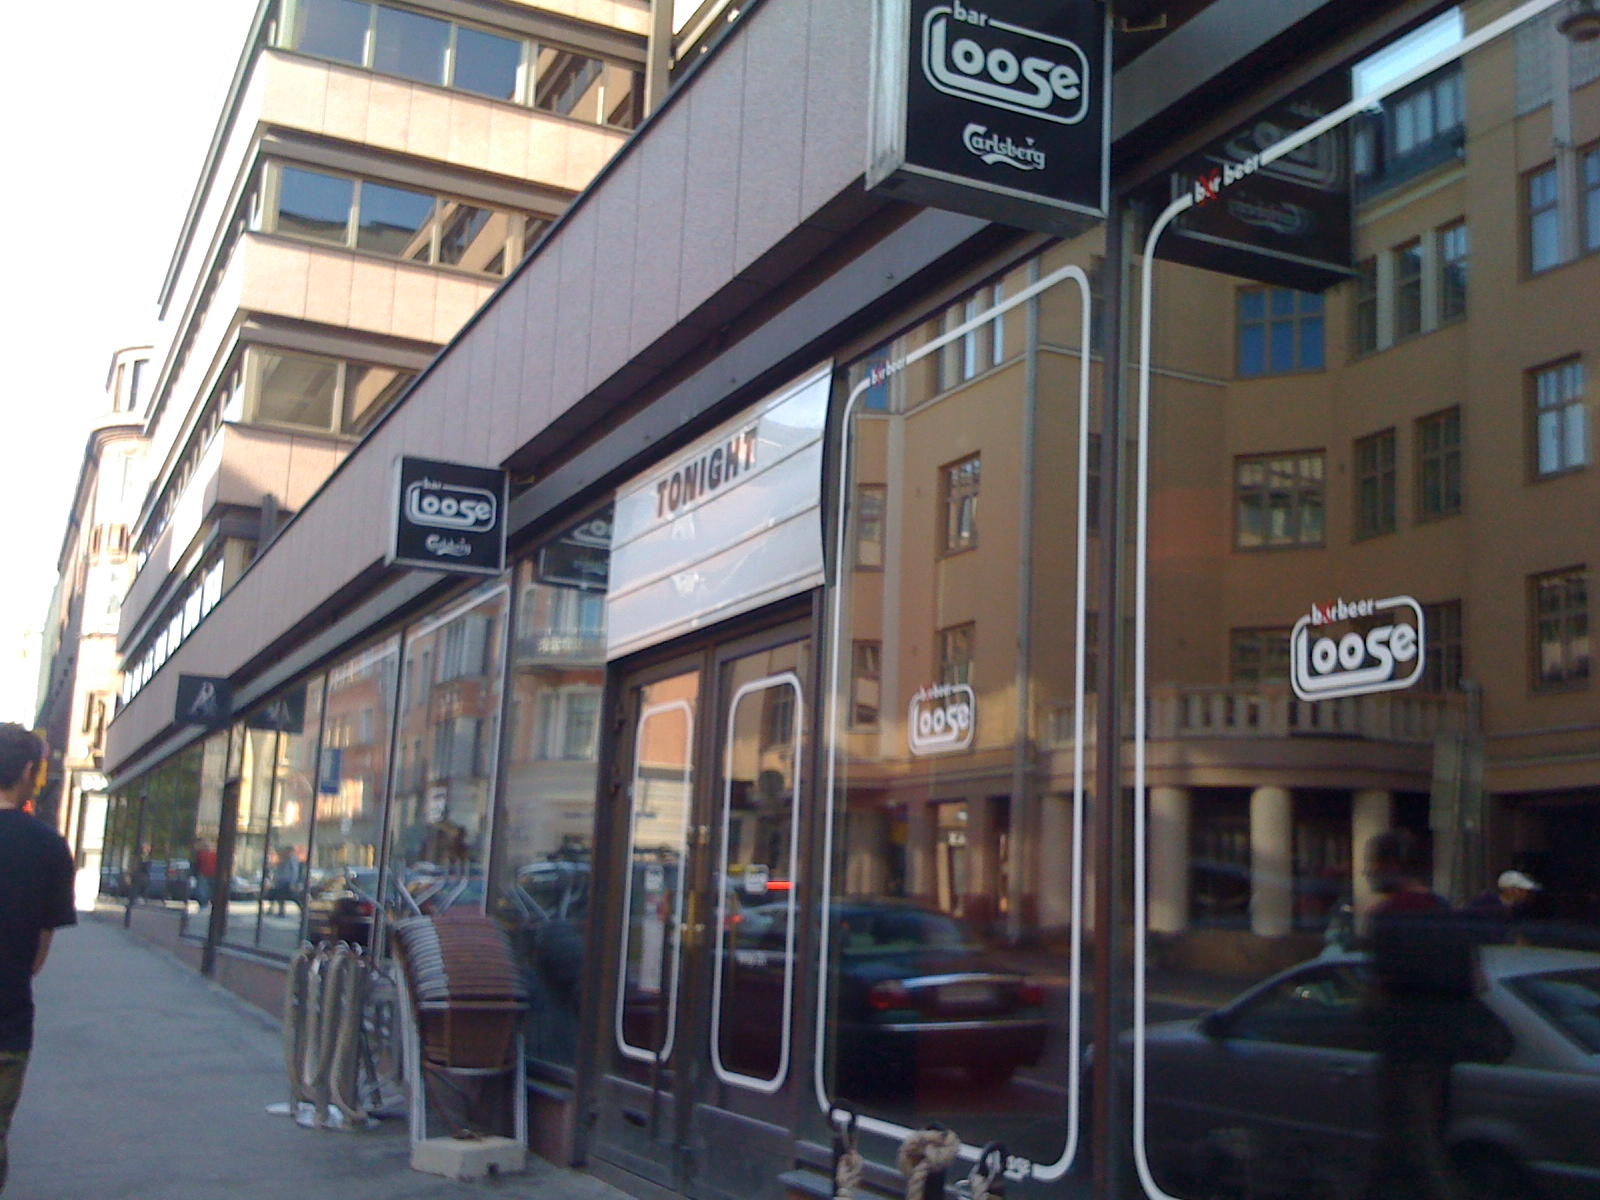 Bar 9 Helsinki